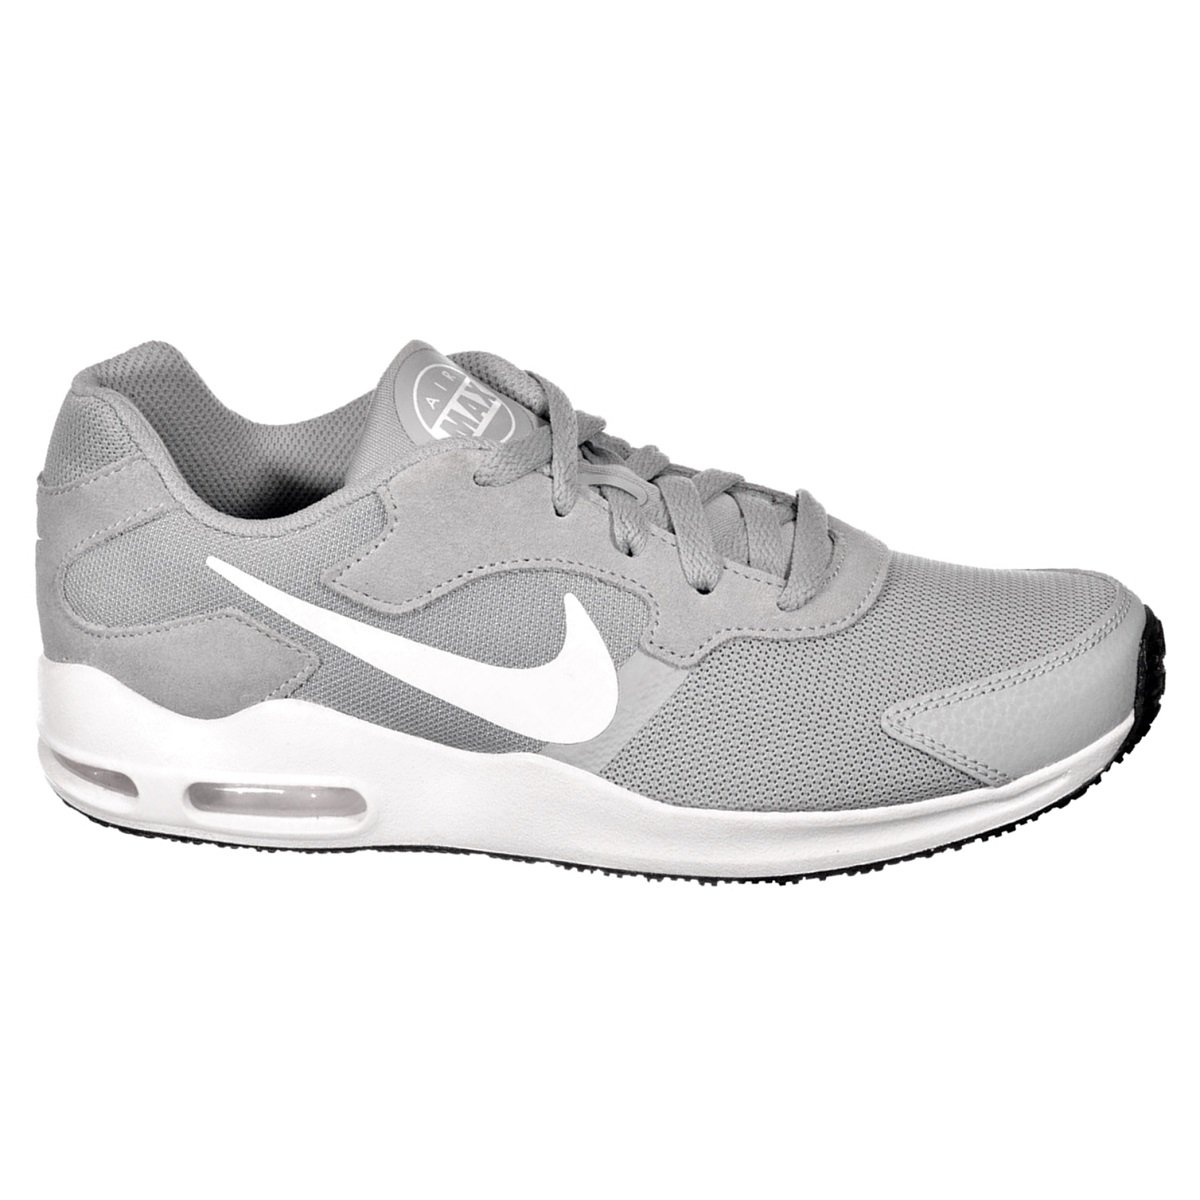 844129e5c Tênis Masculino Nike Air Max Guile 916768-001 - Cinza Branco - Botas ...